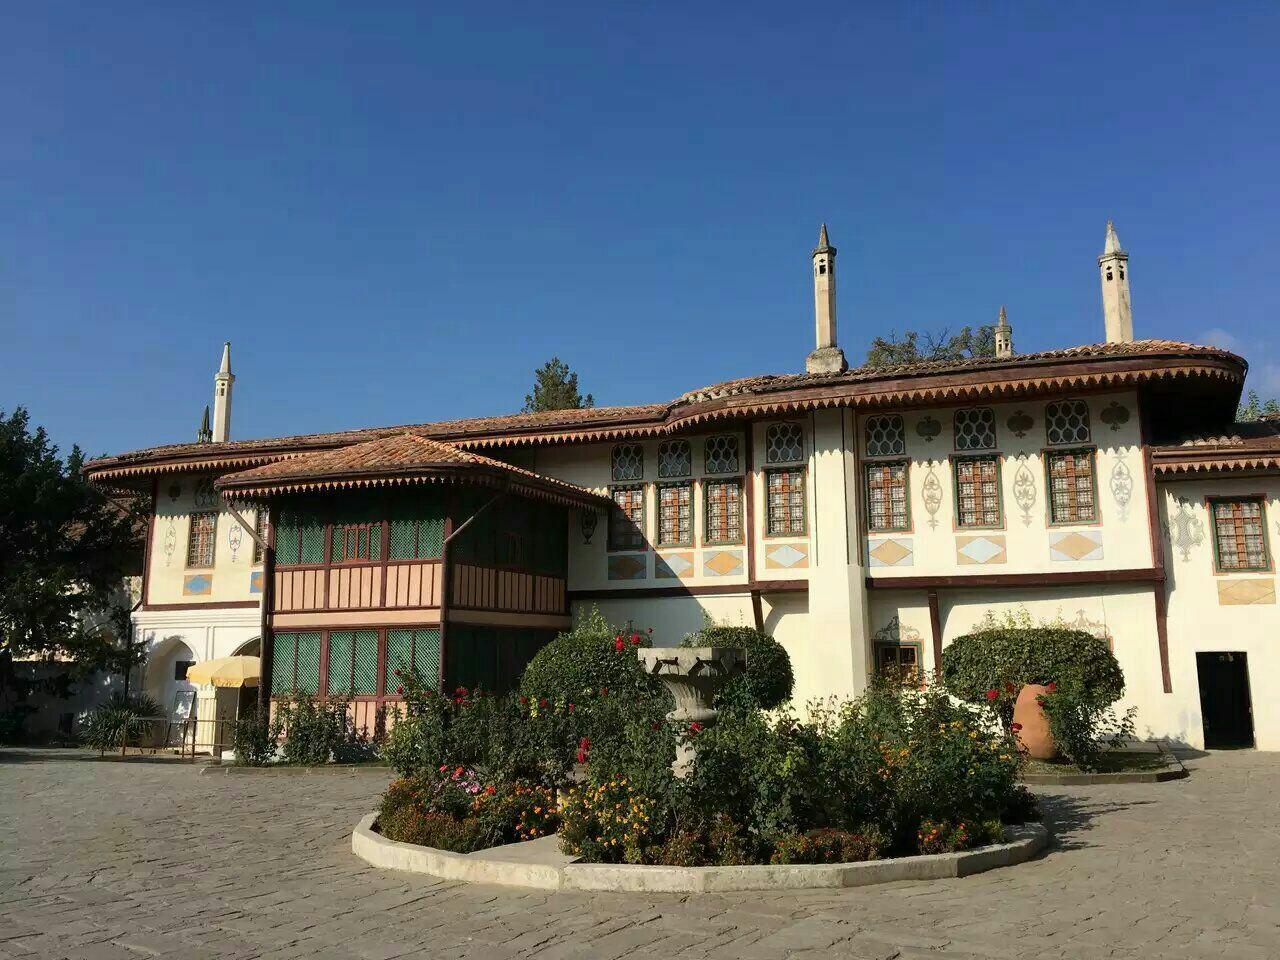 巴赫奇萨赖汗宫  Bakhchisaray Palace   -2